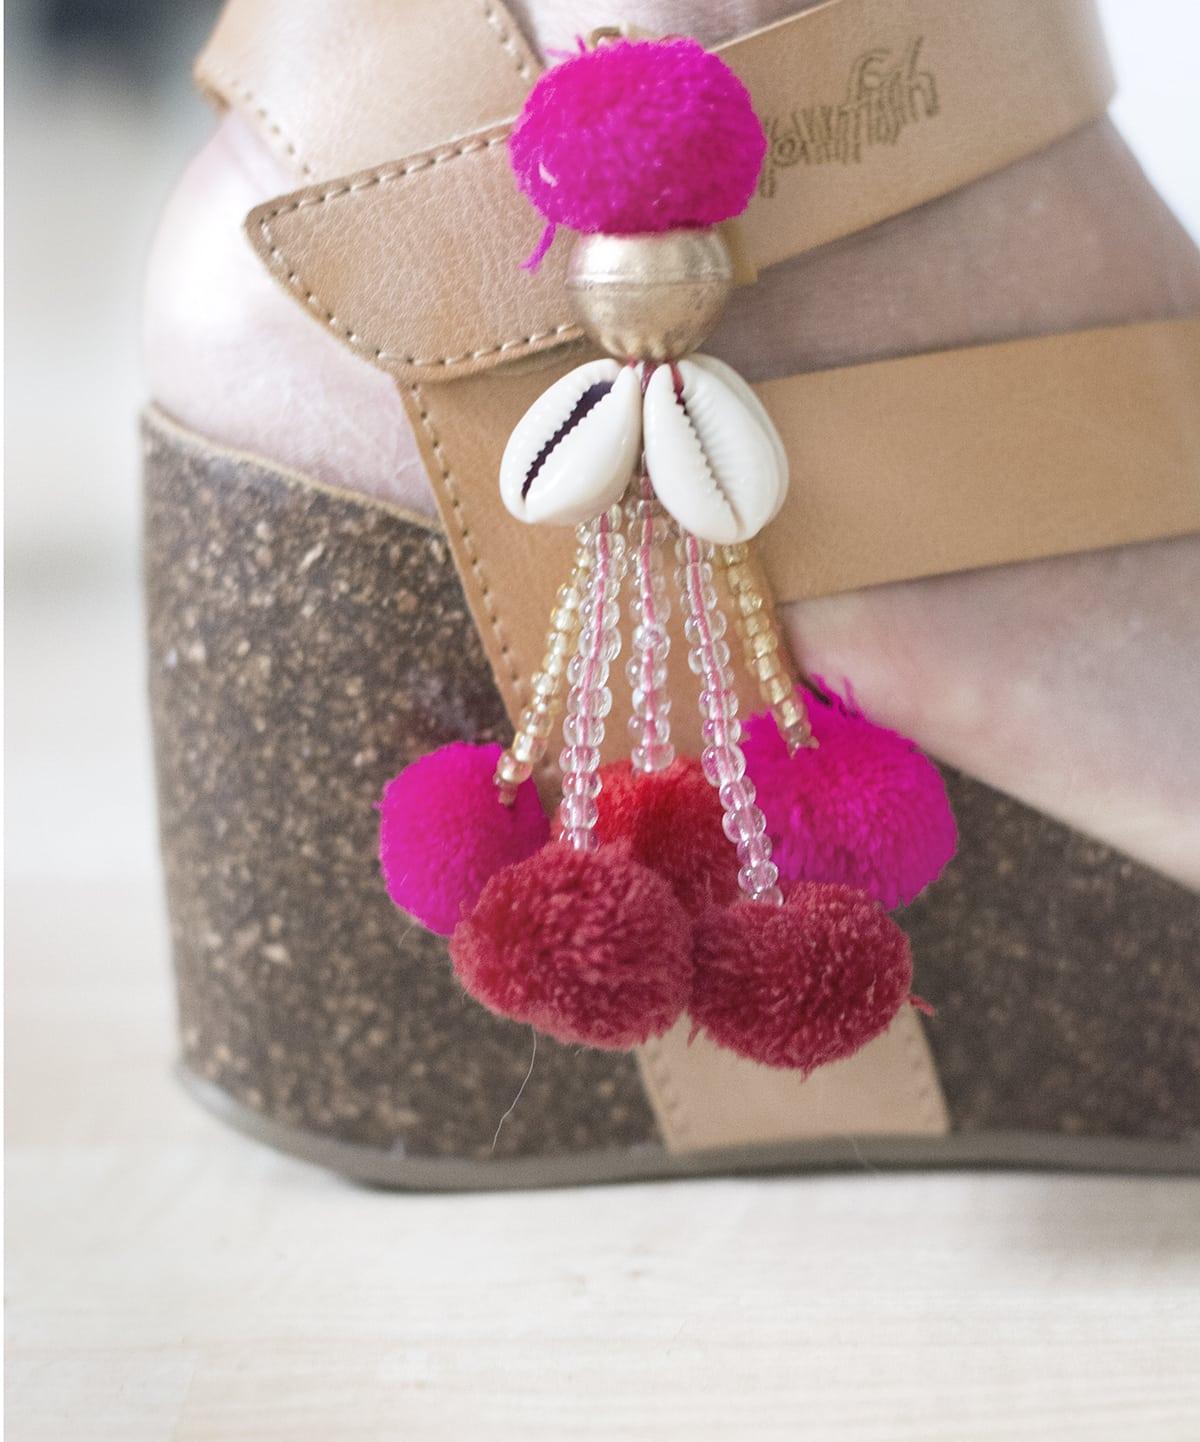 blowfish hapuku sandal